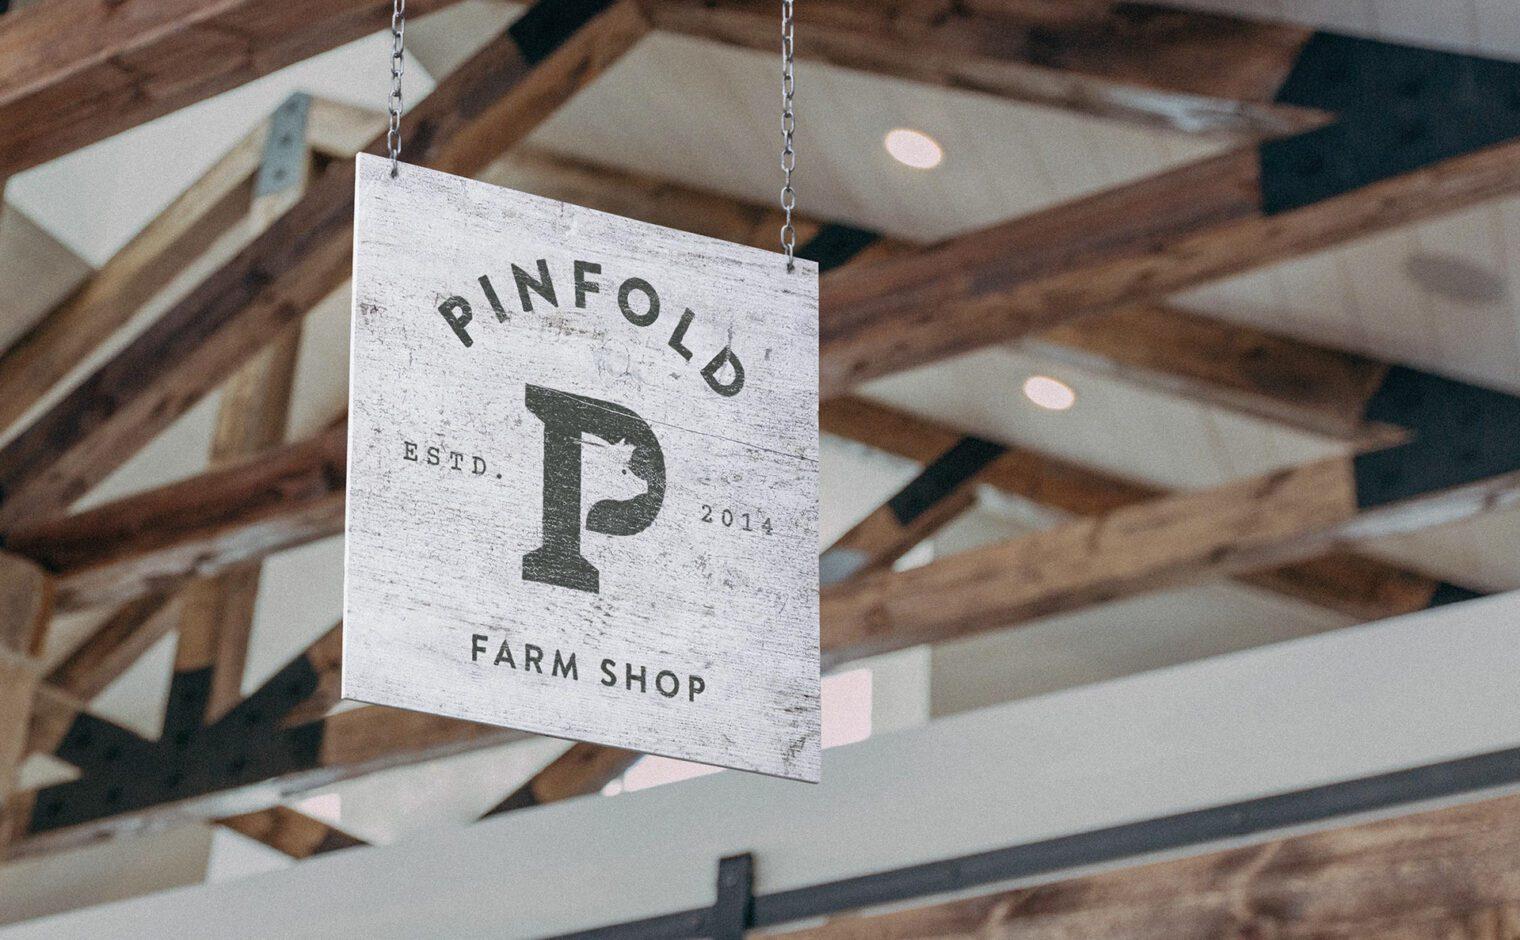 Pinfold Farm Shop internal wooden hanging sign